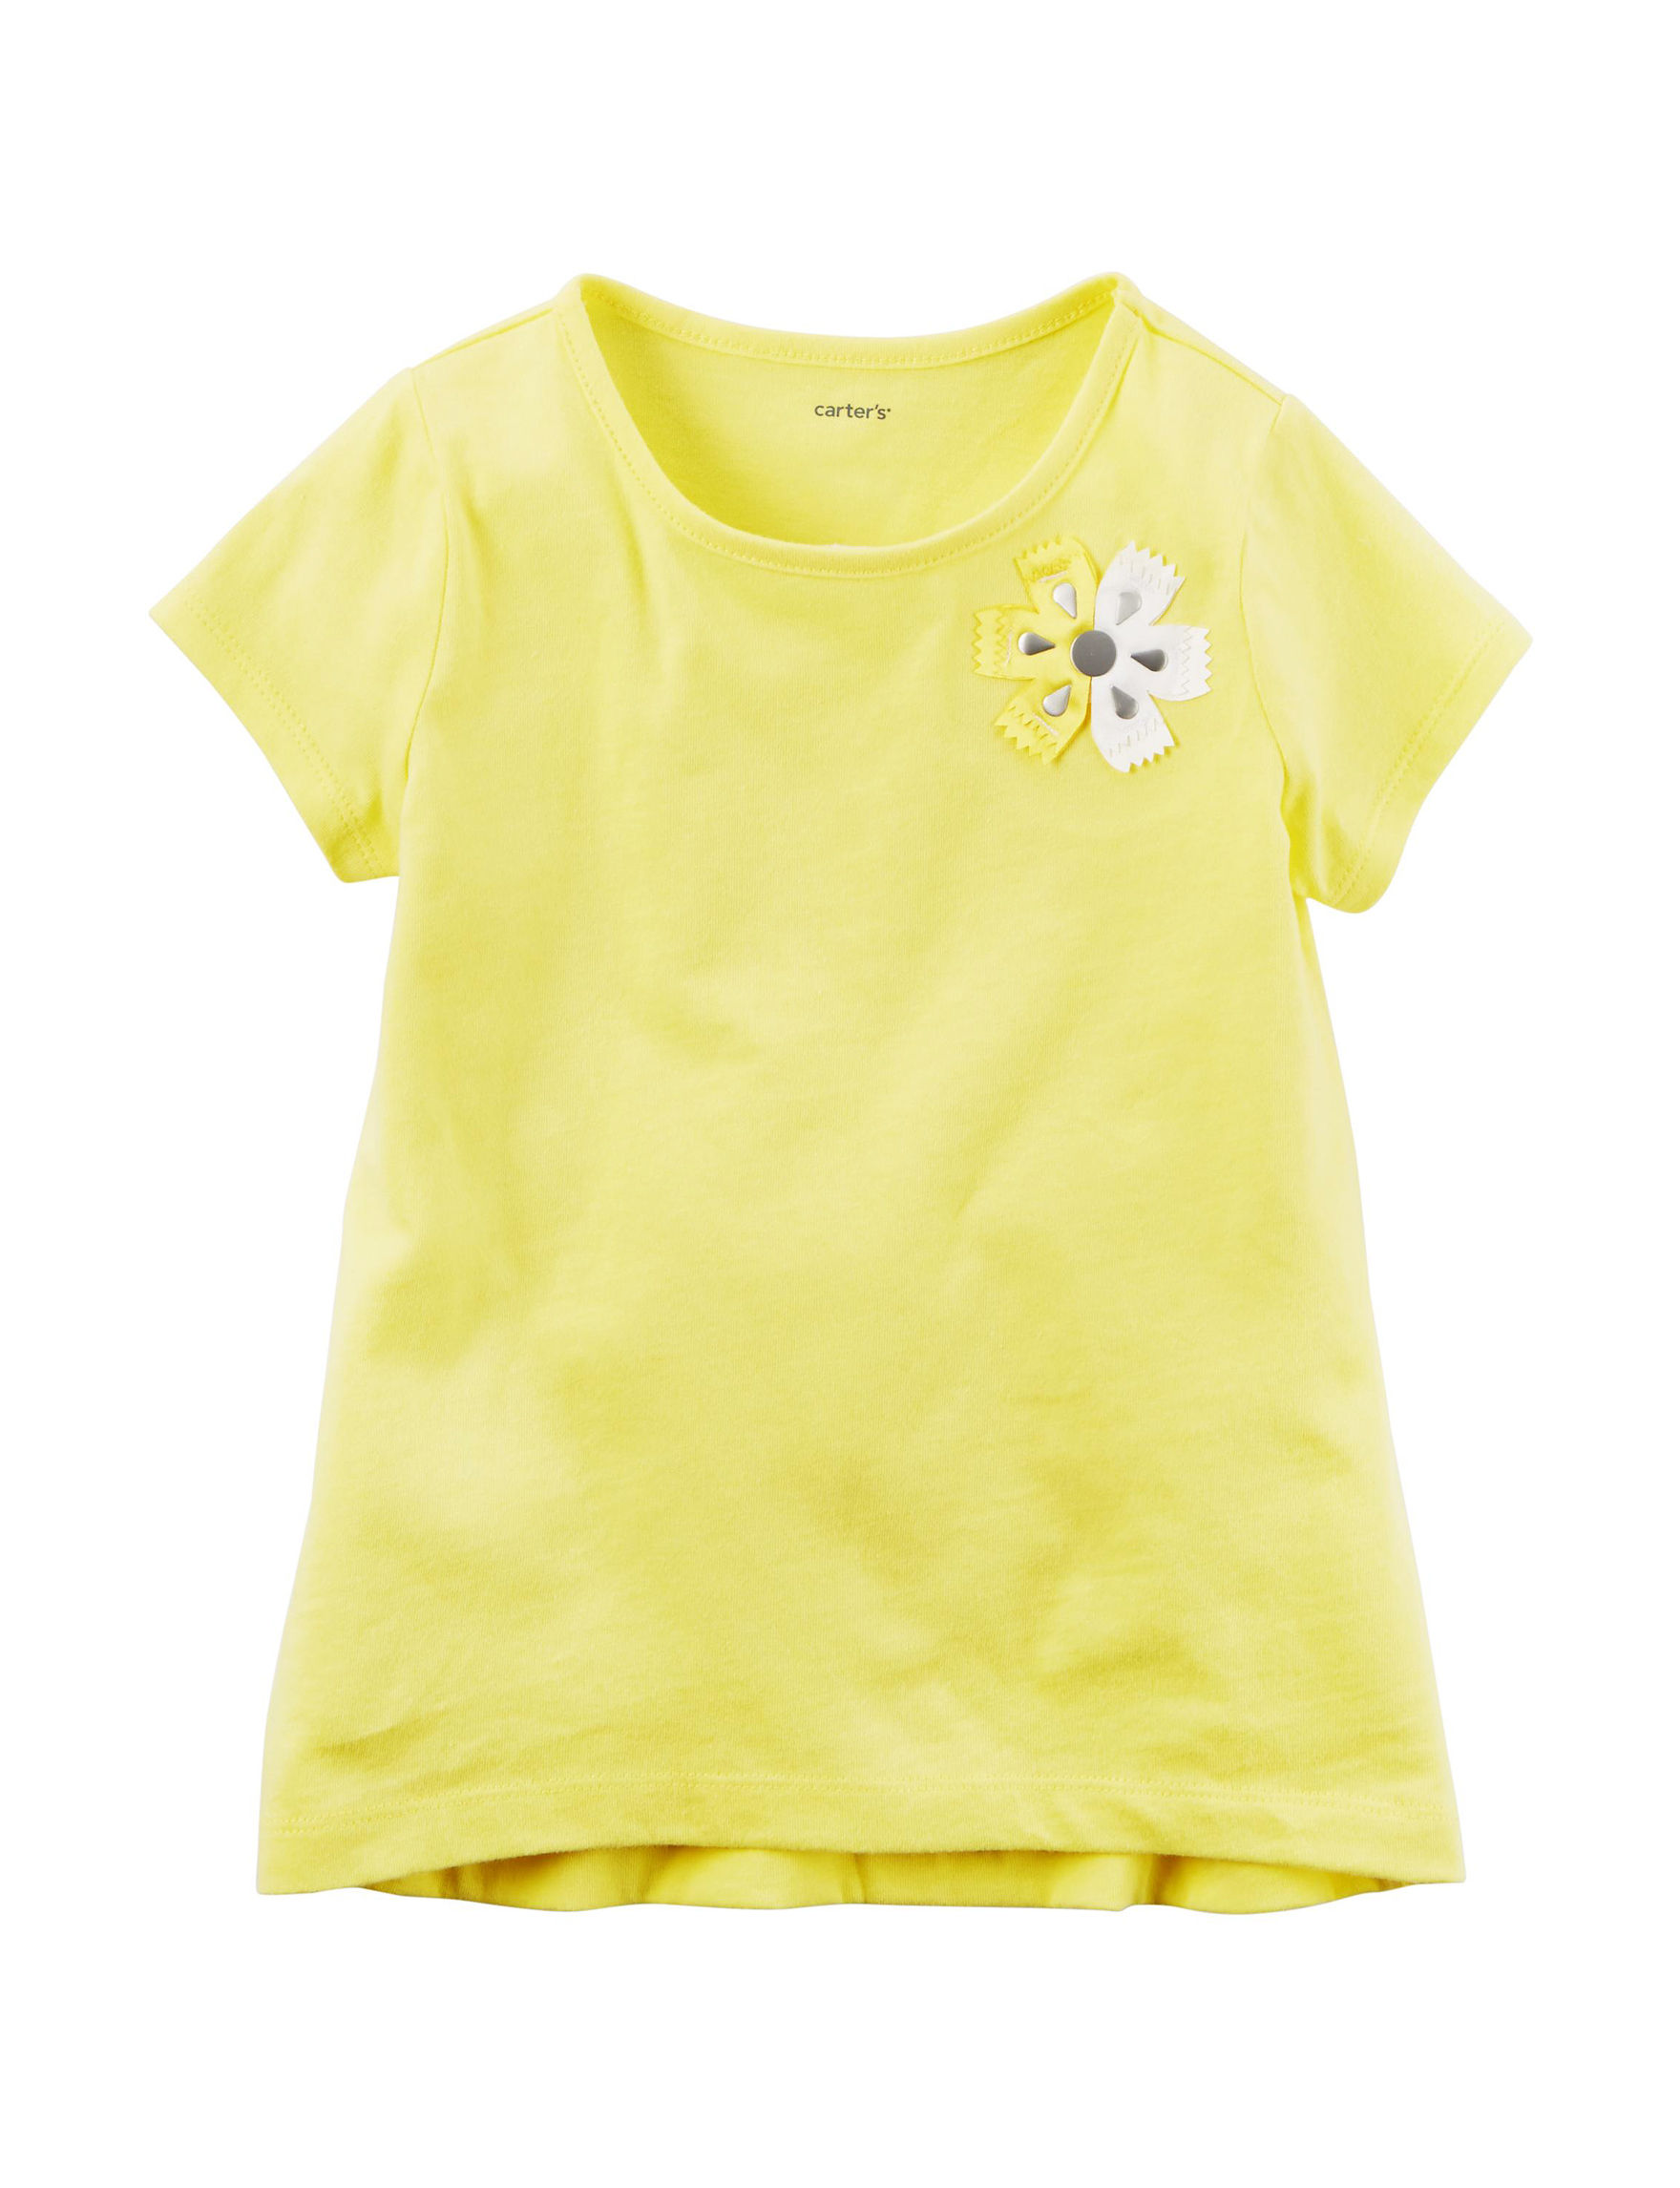 Carter's Yellow